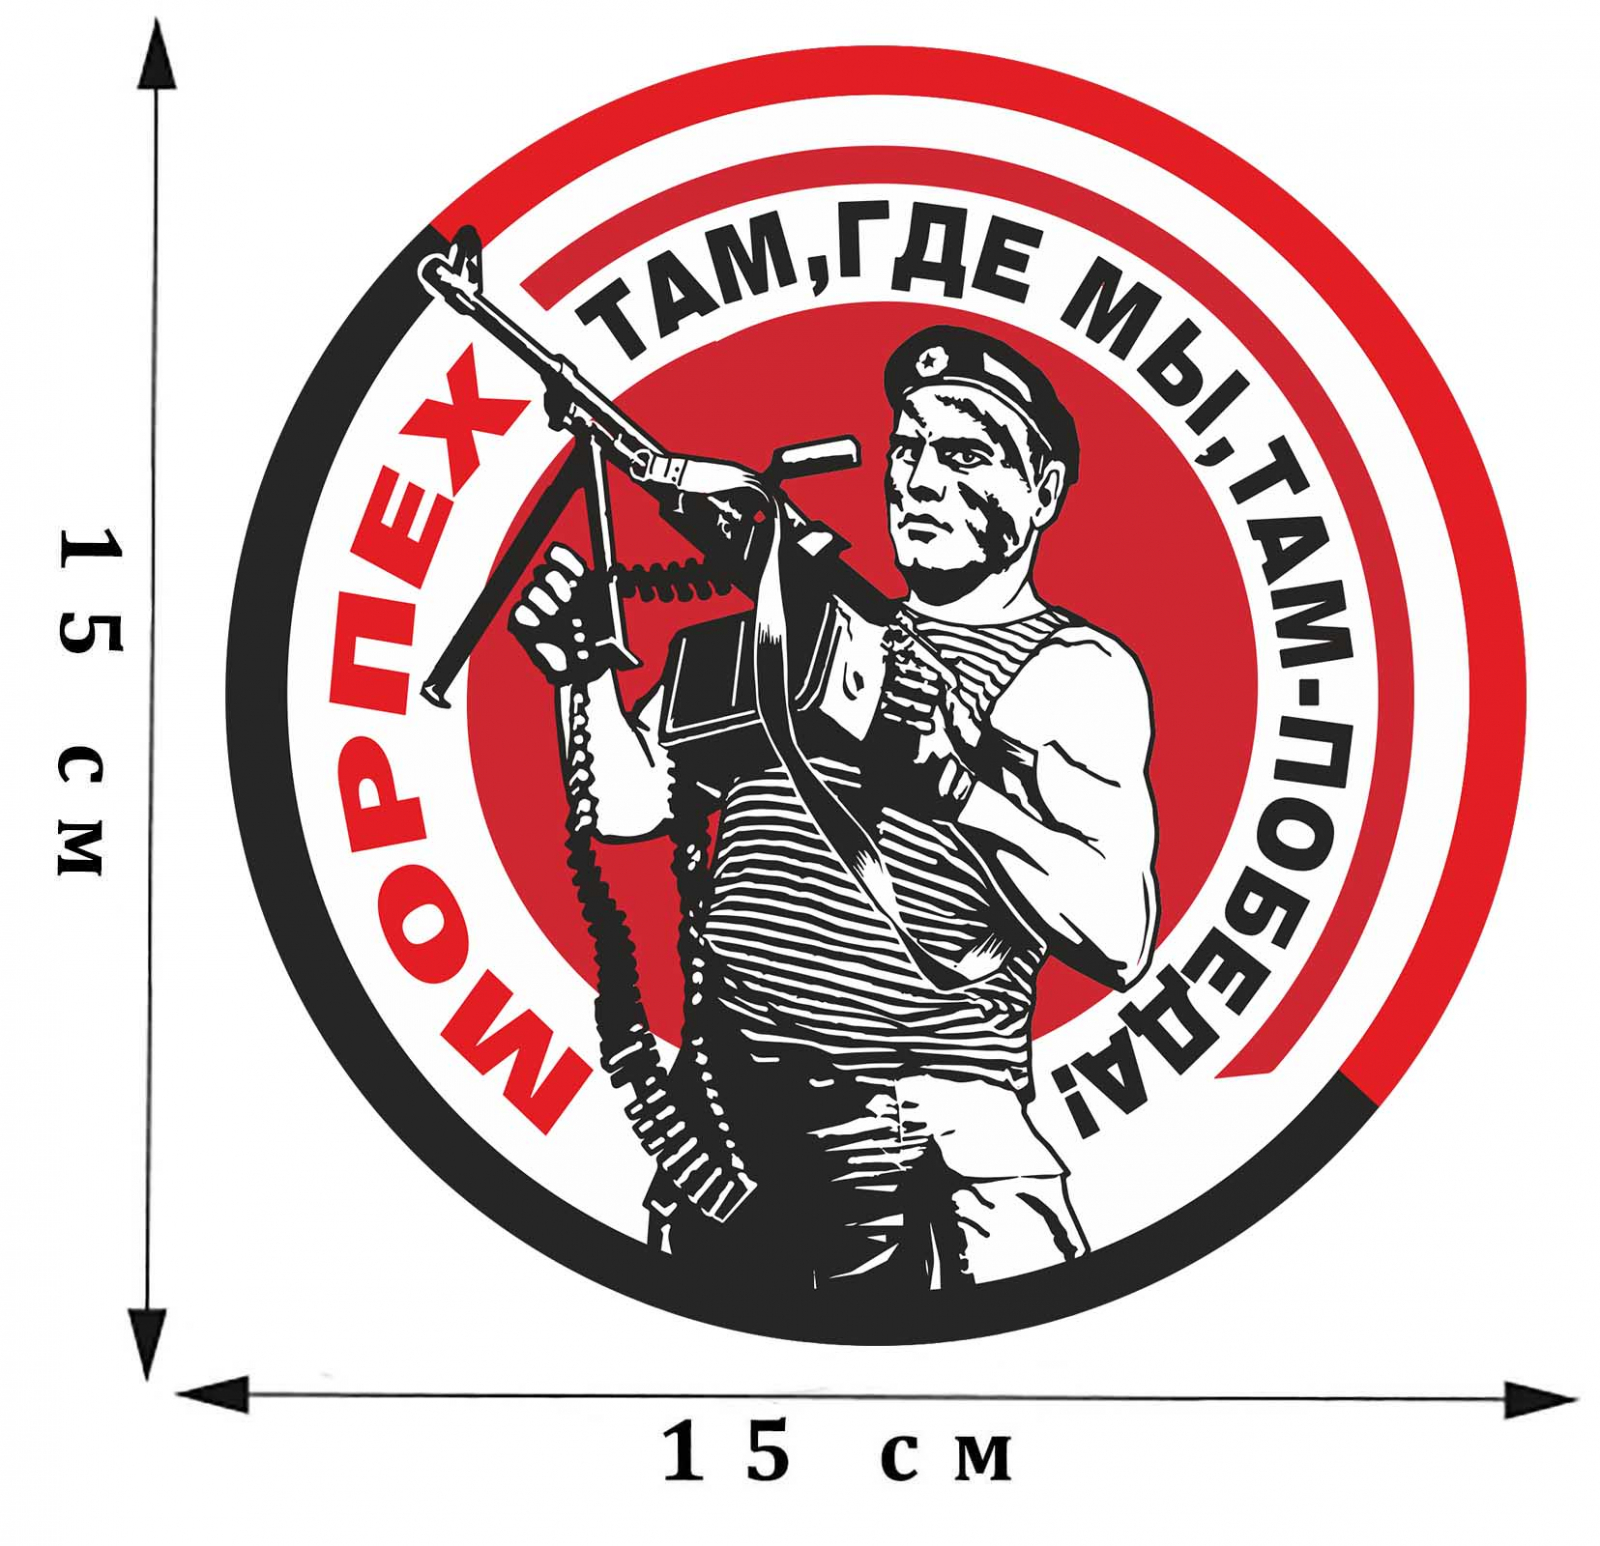 Наклейка с девизом Морпеха